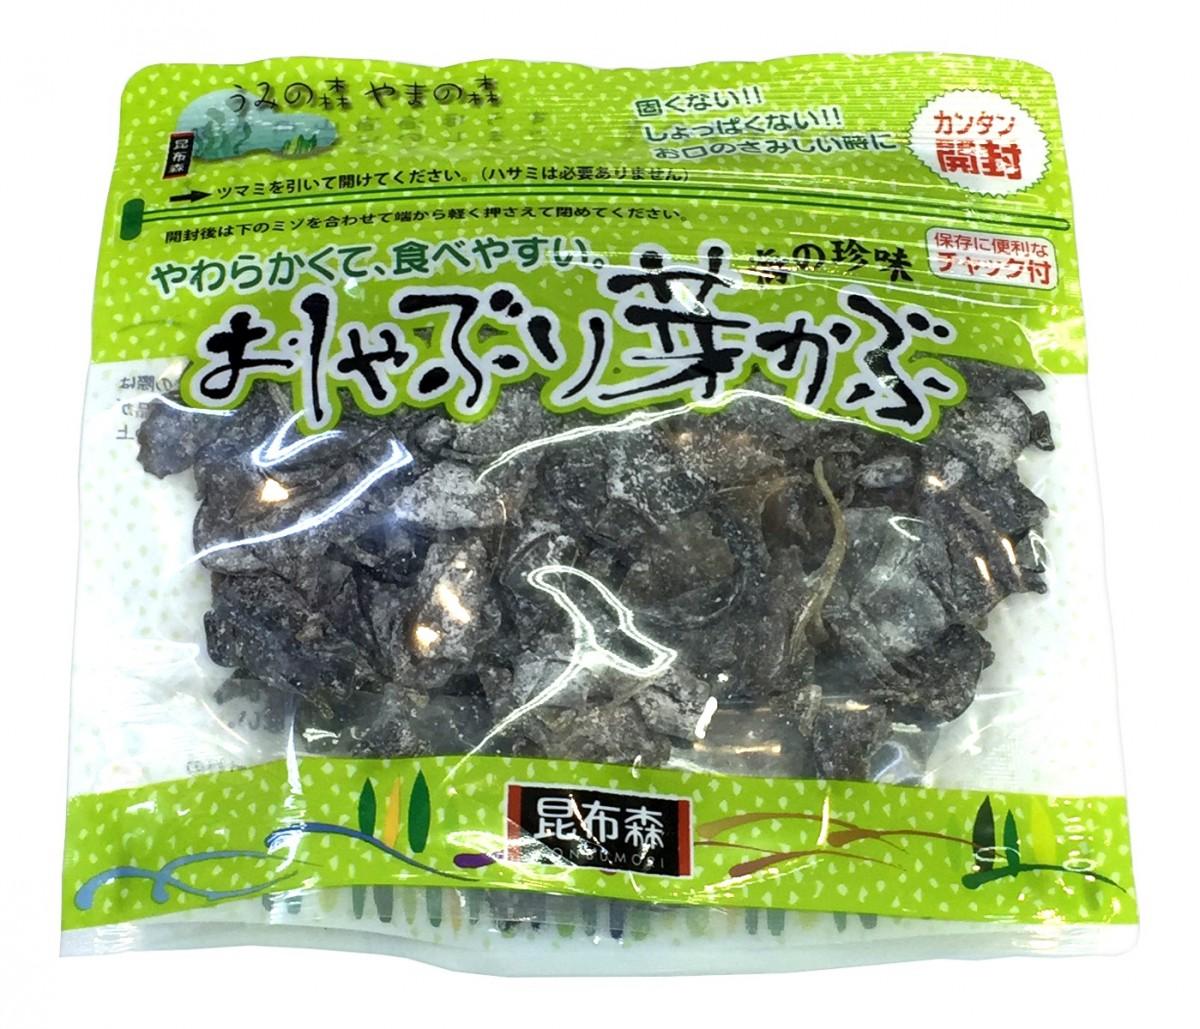 Oshaburi Mekabu Seaweed, 95g